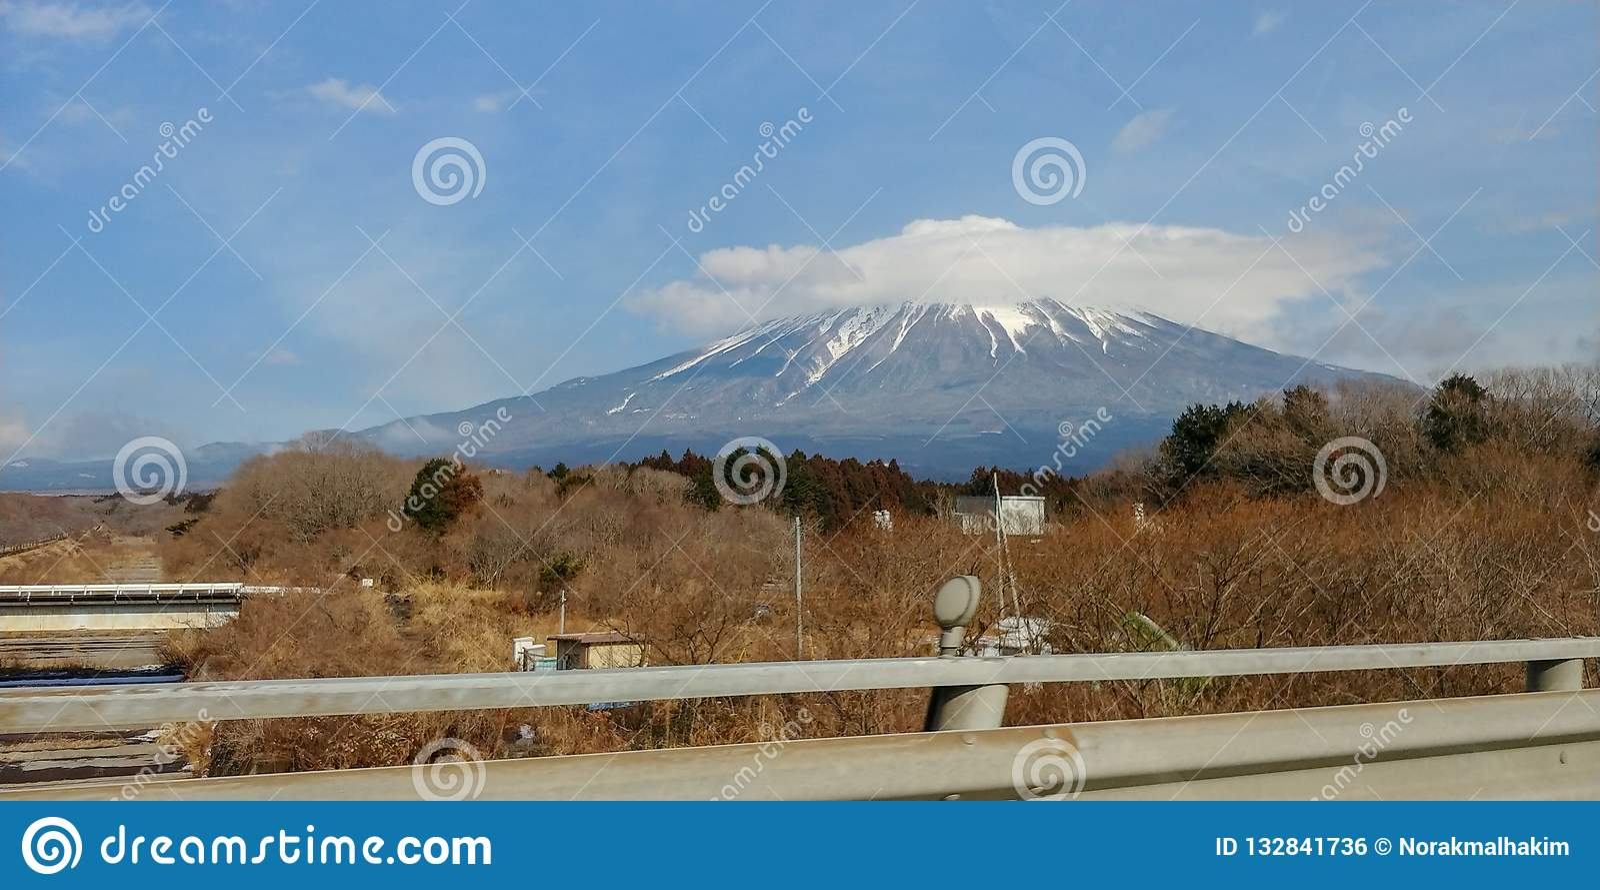 Mount Fuji on the road